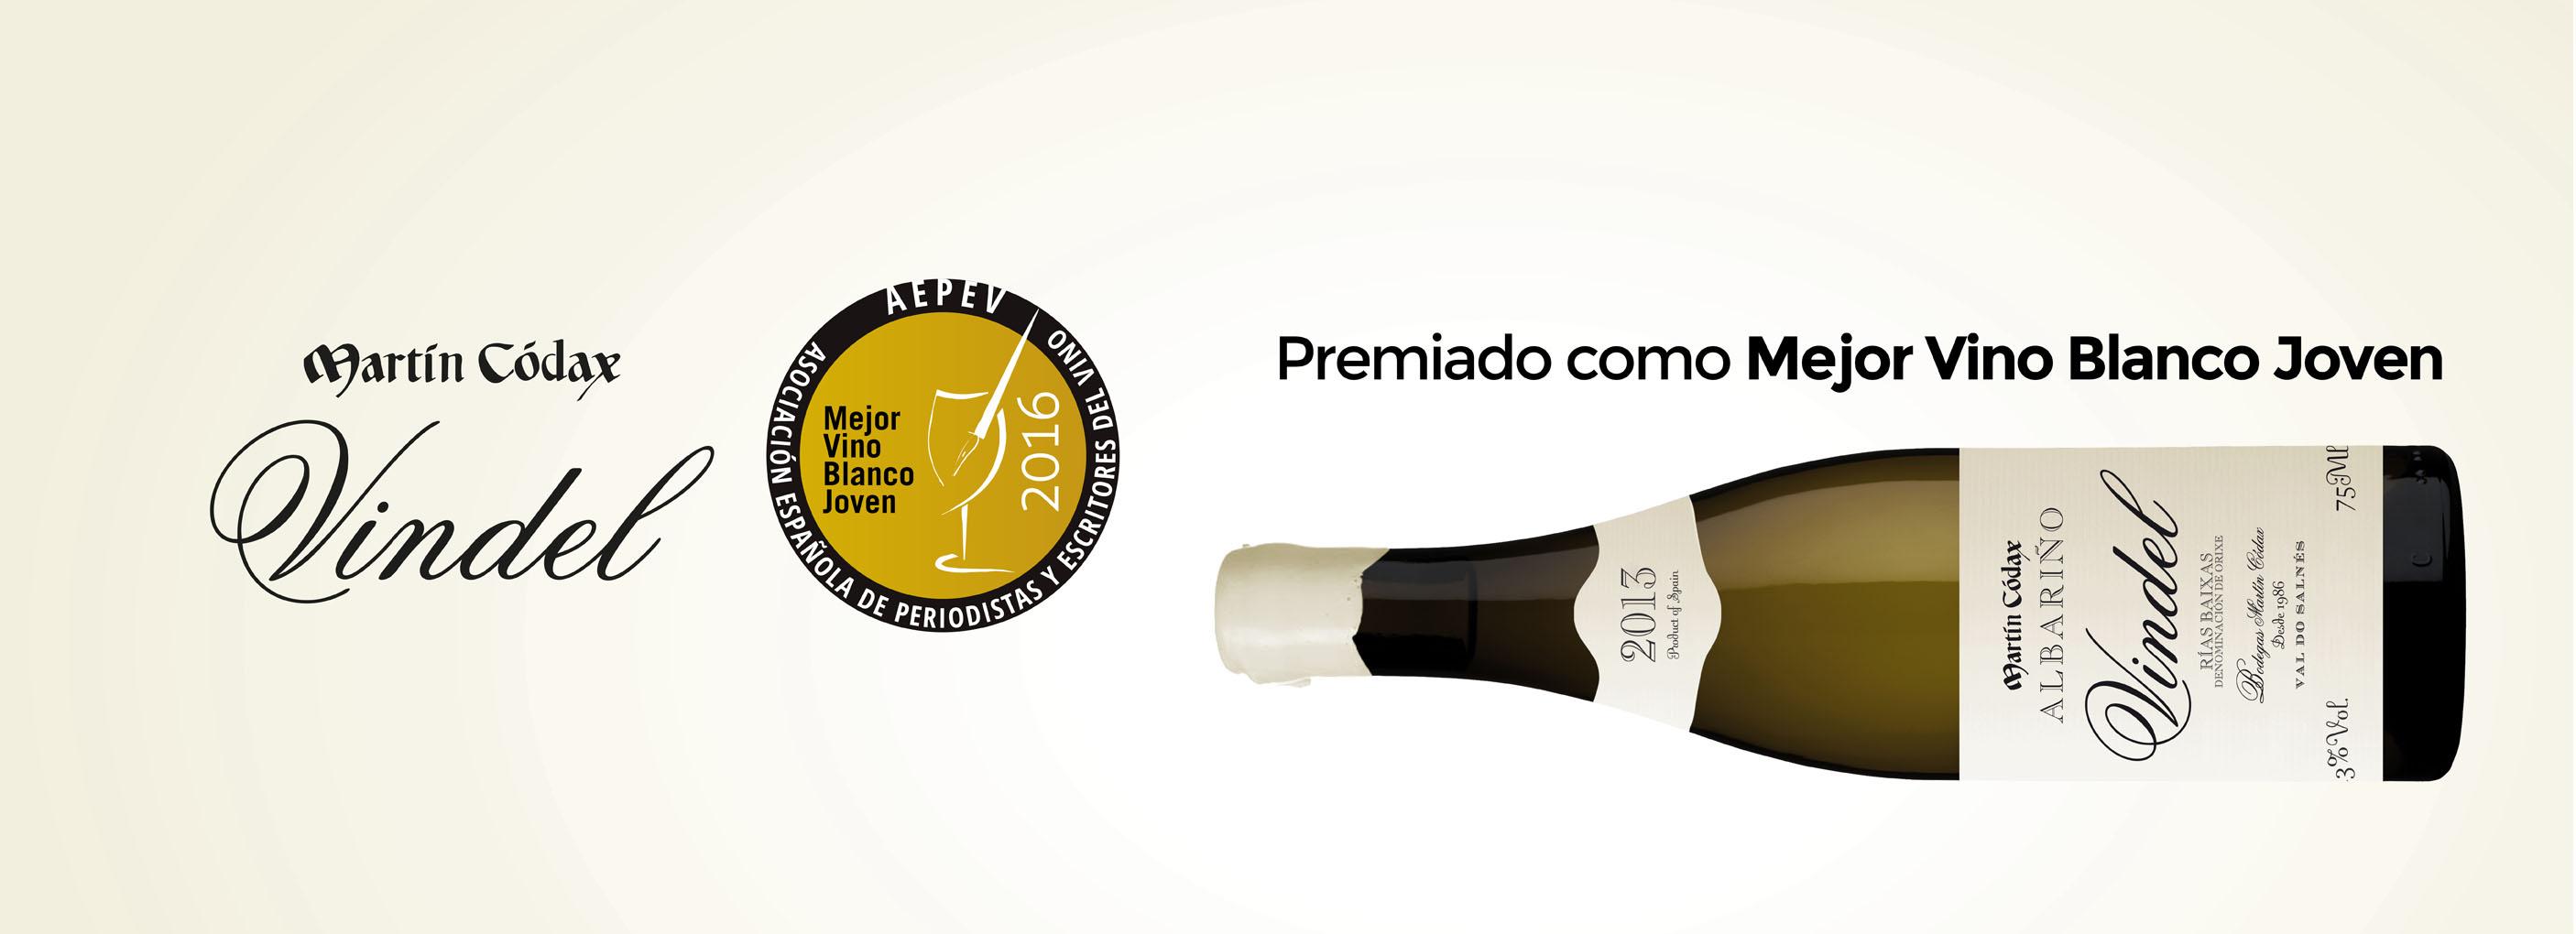 Martín Códax Vindel, Best White Wine without oak 2016